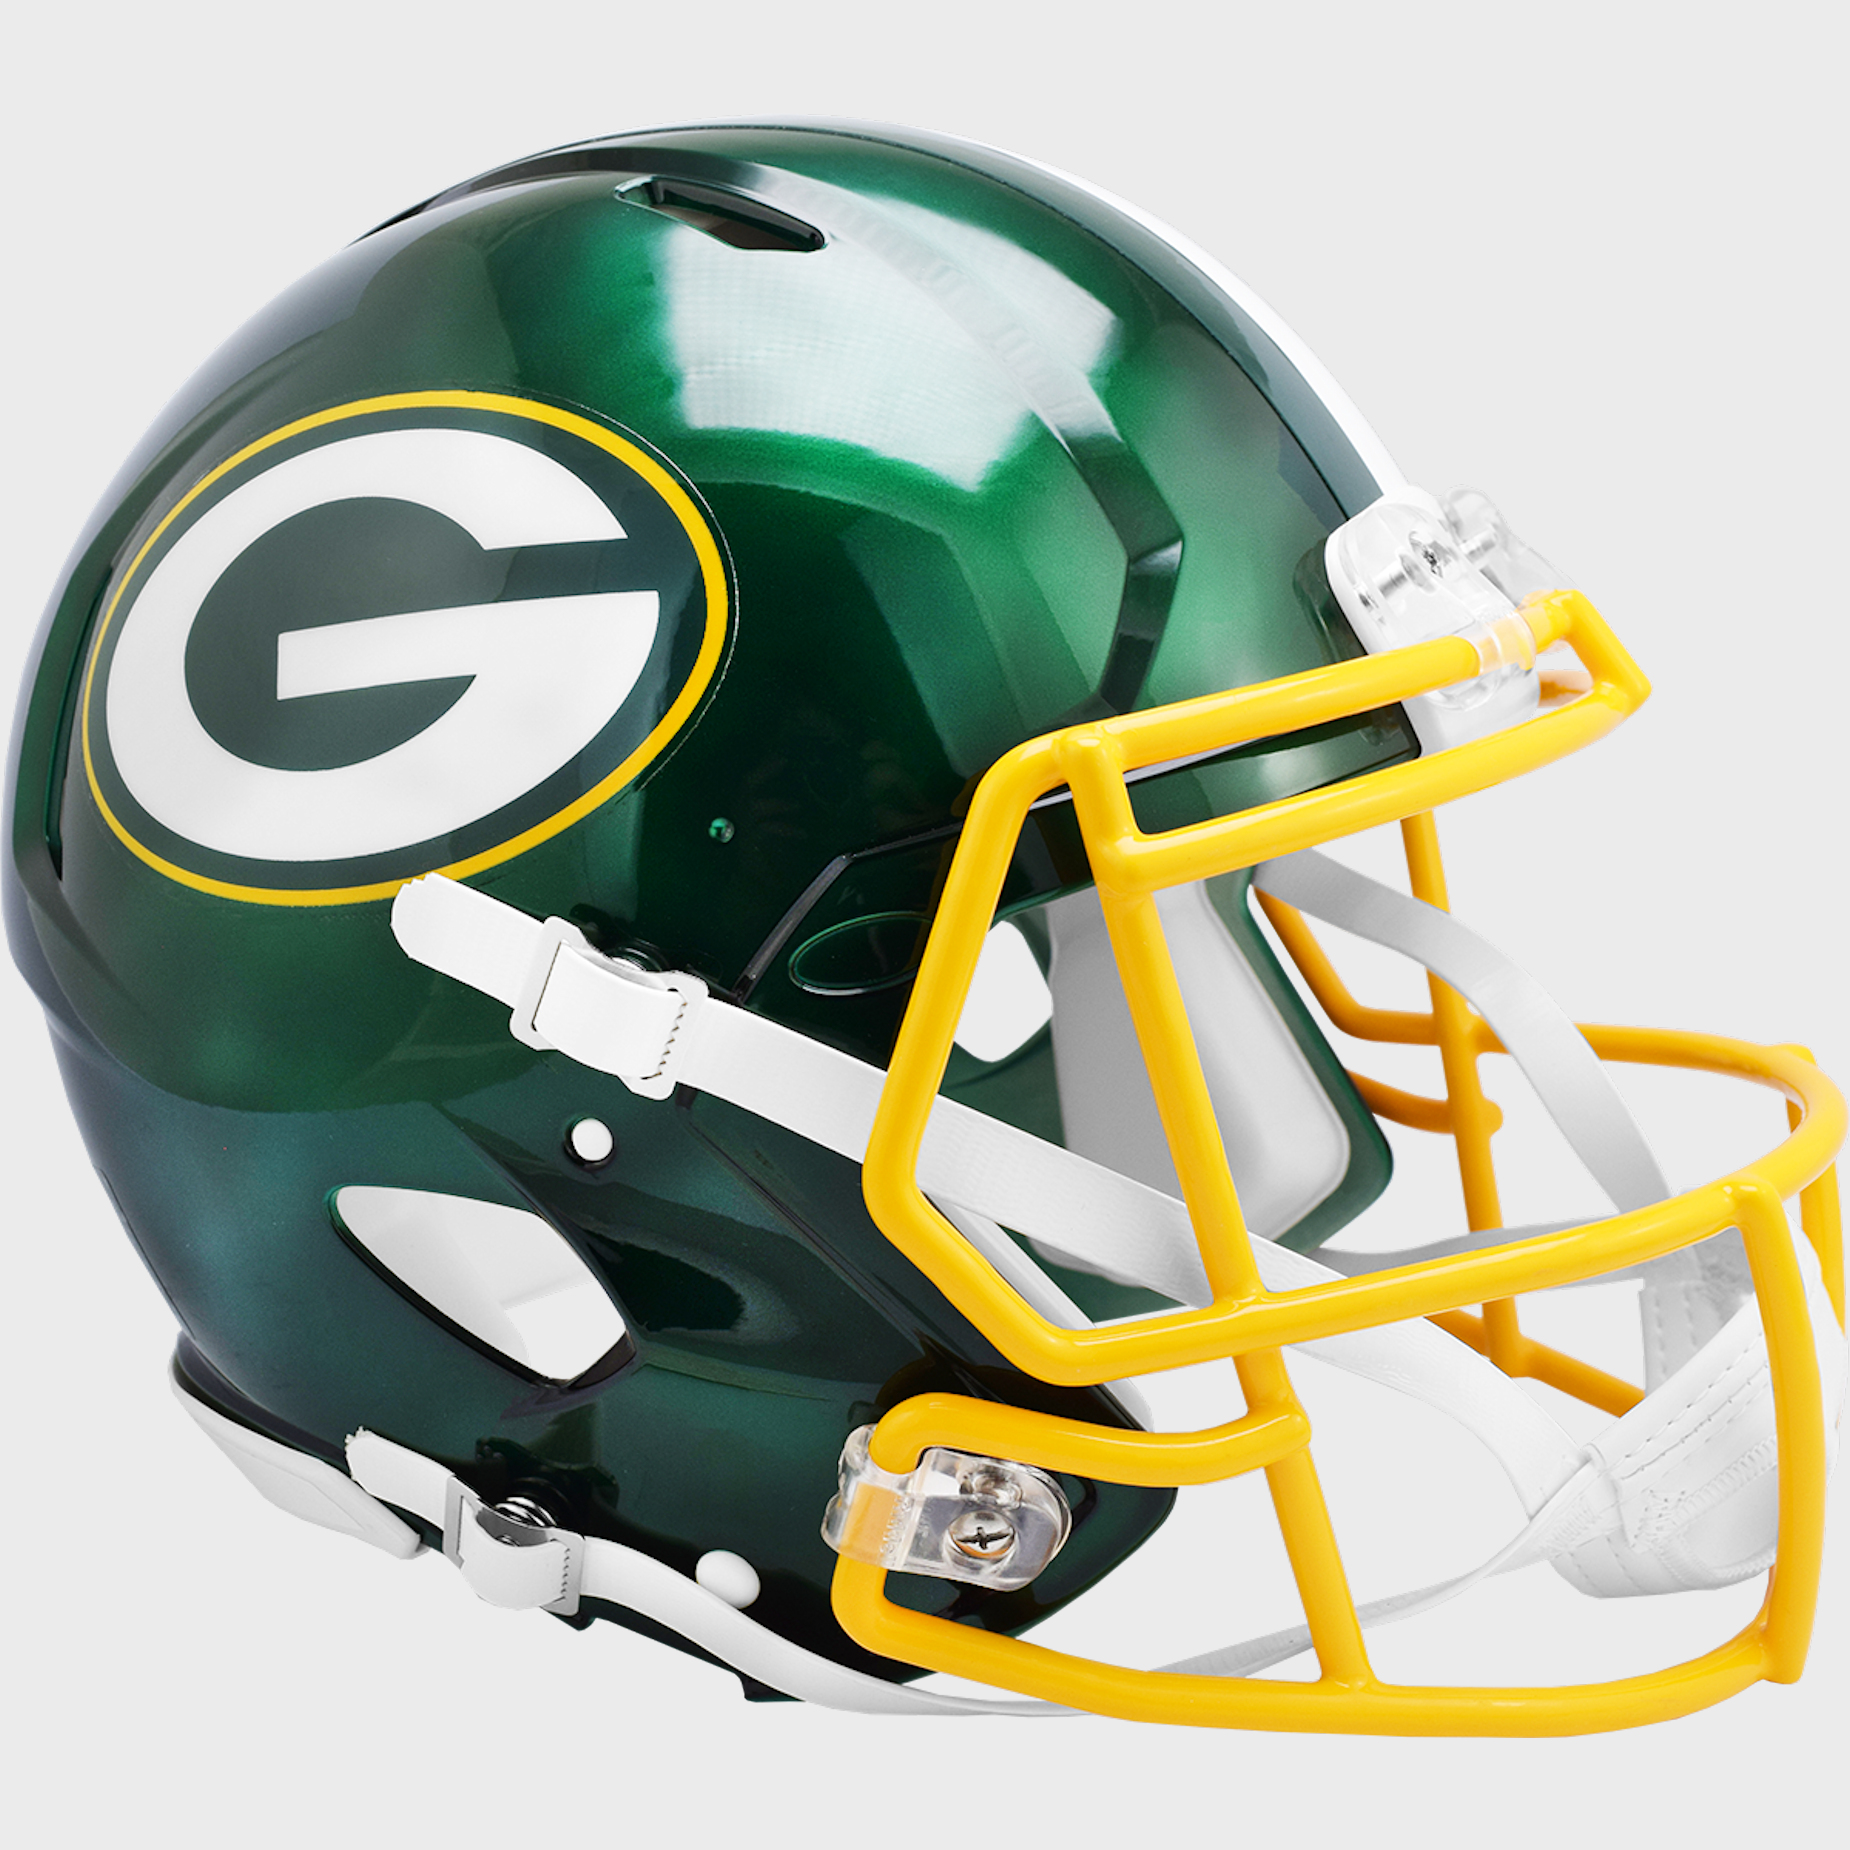 Green Bay Packers Speed Football Helmet <B>FLASH ESD 8/21/21</B>